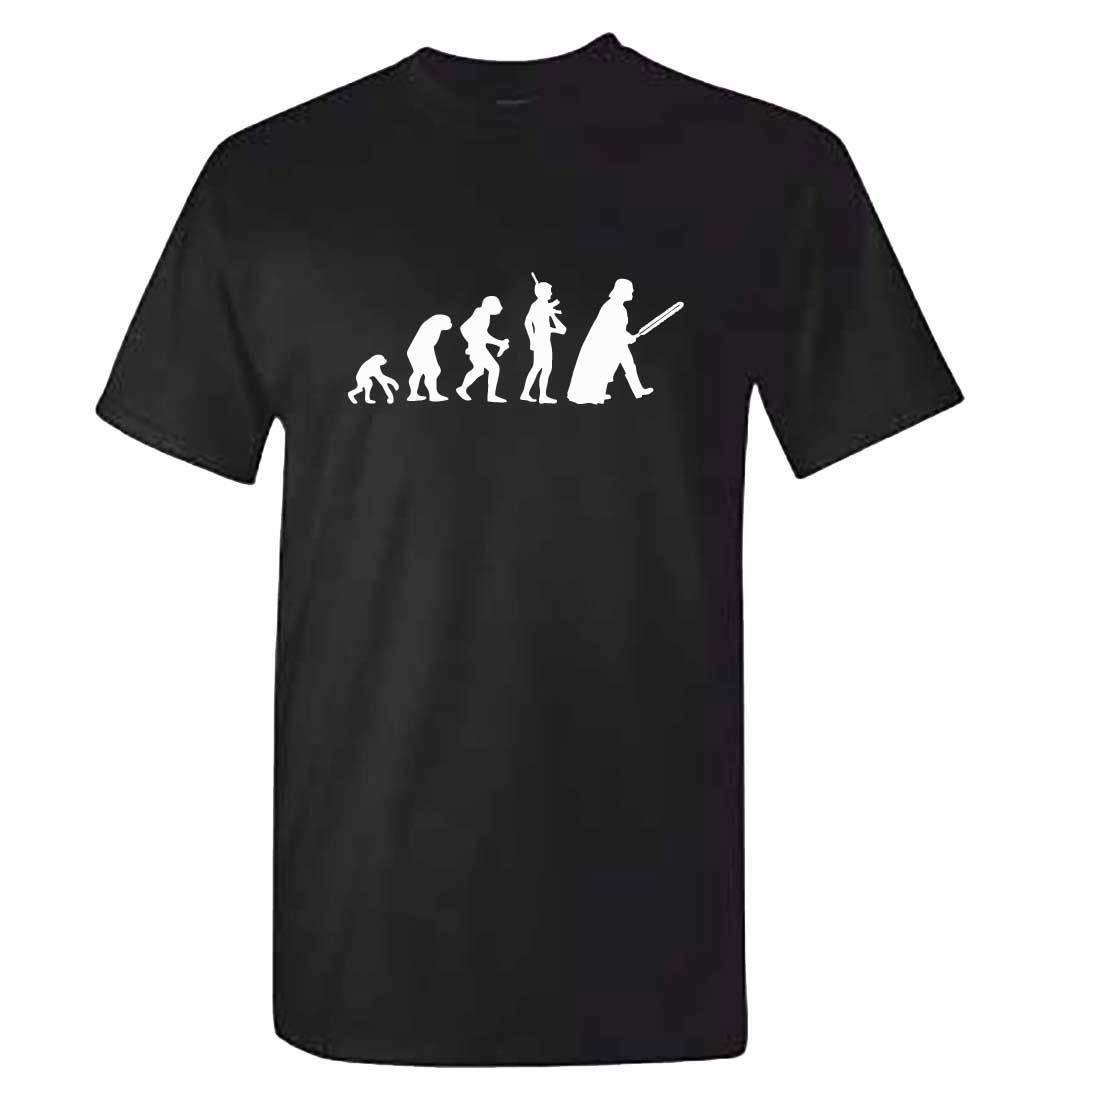 Star Wars Evolution T-Shirt - Mens Darth Vader Movie Last Jedi Fathers Day Summer Short Sleeves Fashion T Shirt Free Shipping